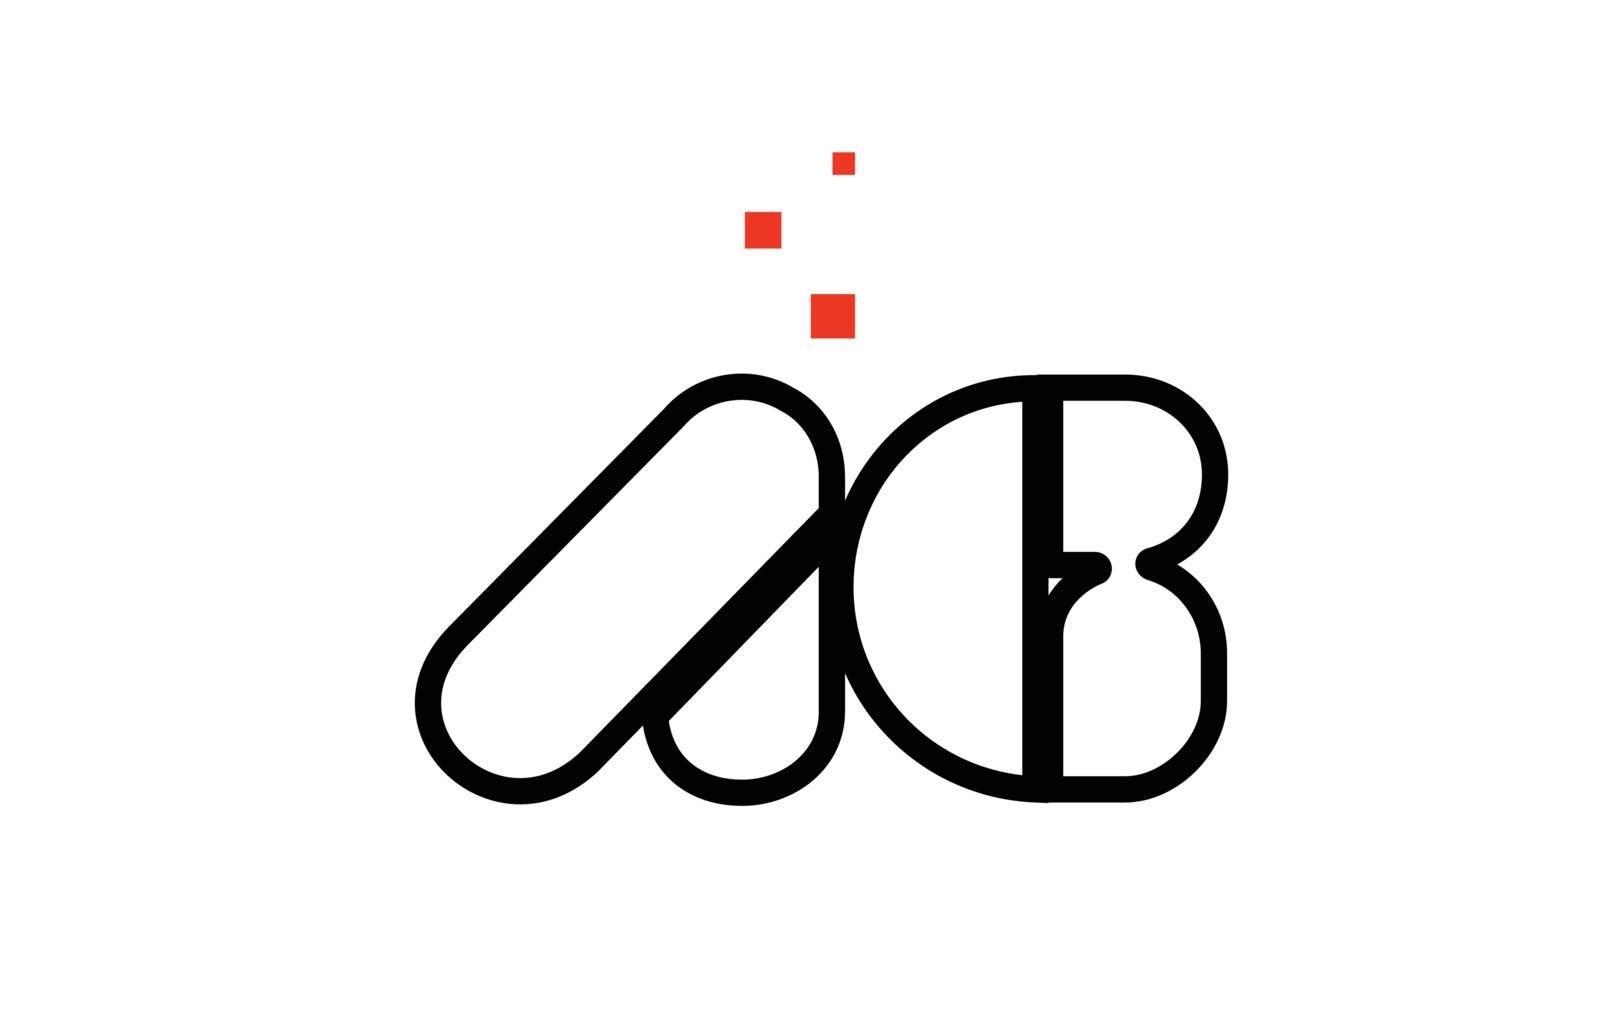 AG A G black white red alphabet letter combination logo icon des by dragomirescu